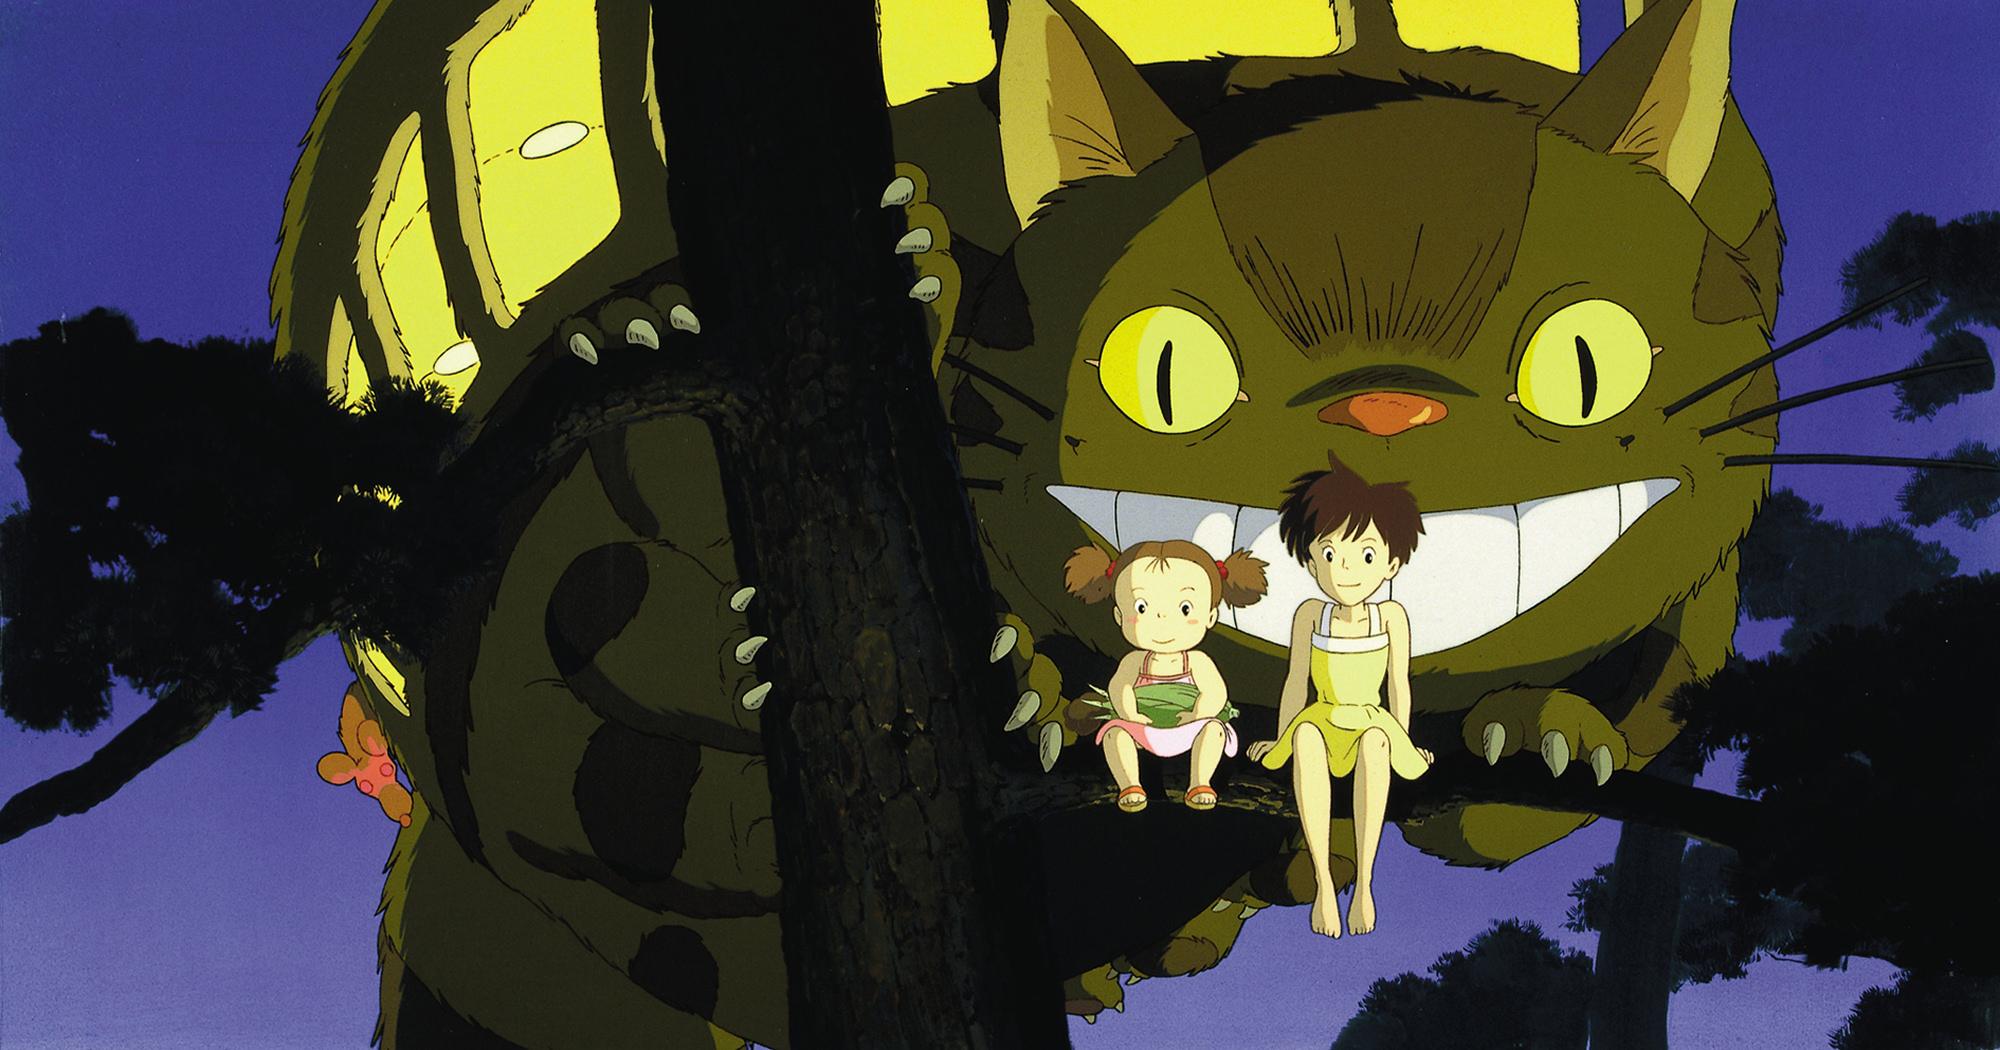 Free Download Totoro Wallpapers My Neighbor Totoro Wallpaper Anime